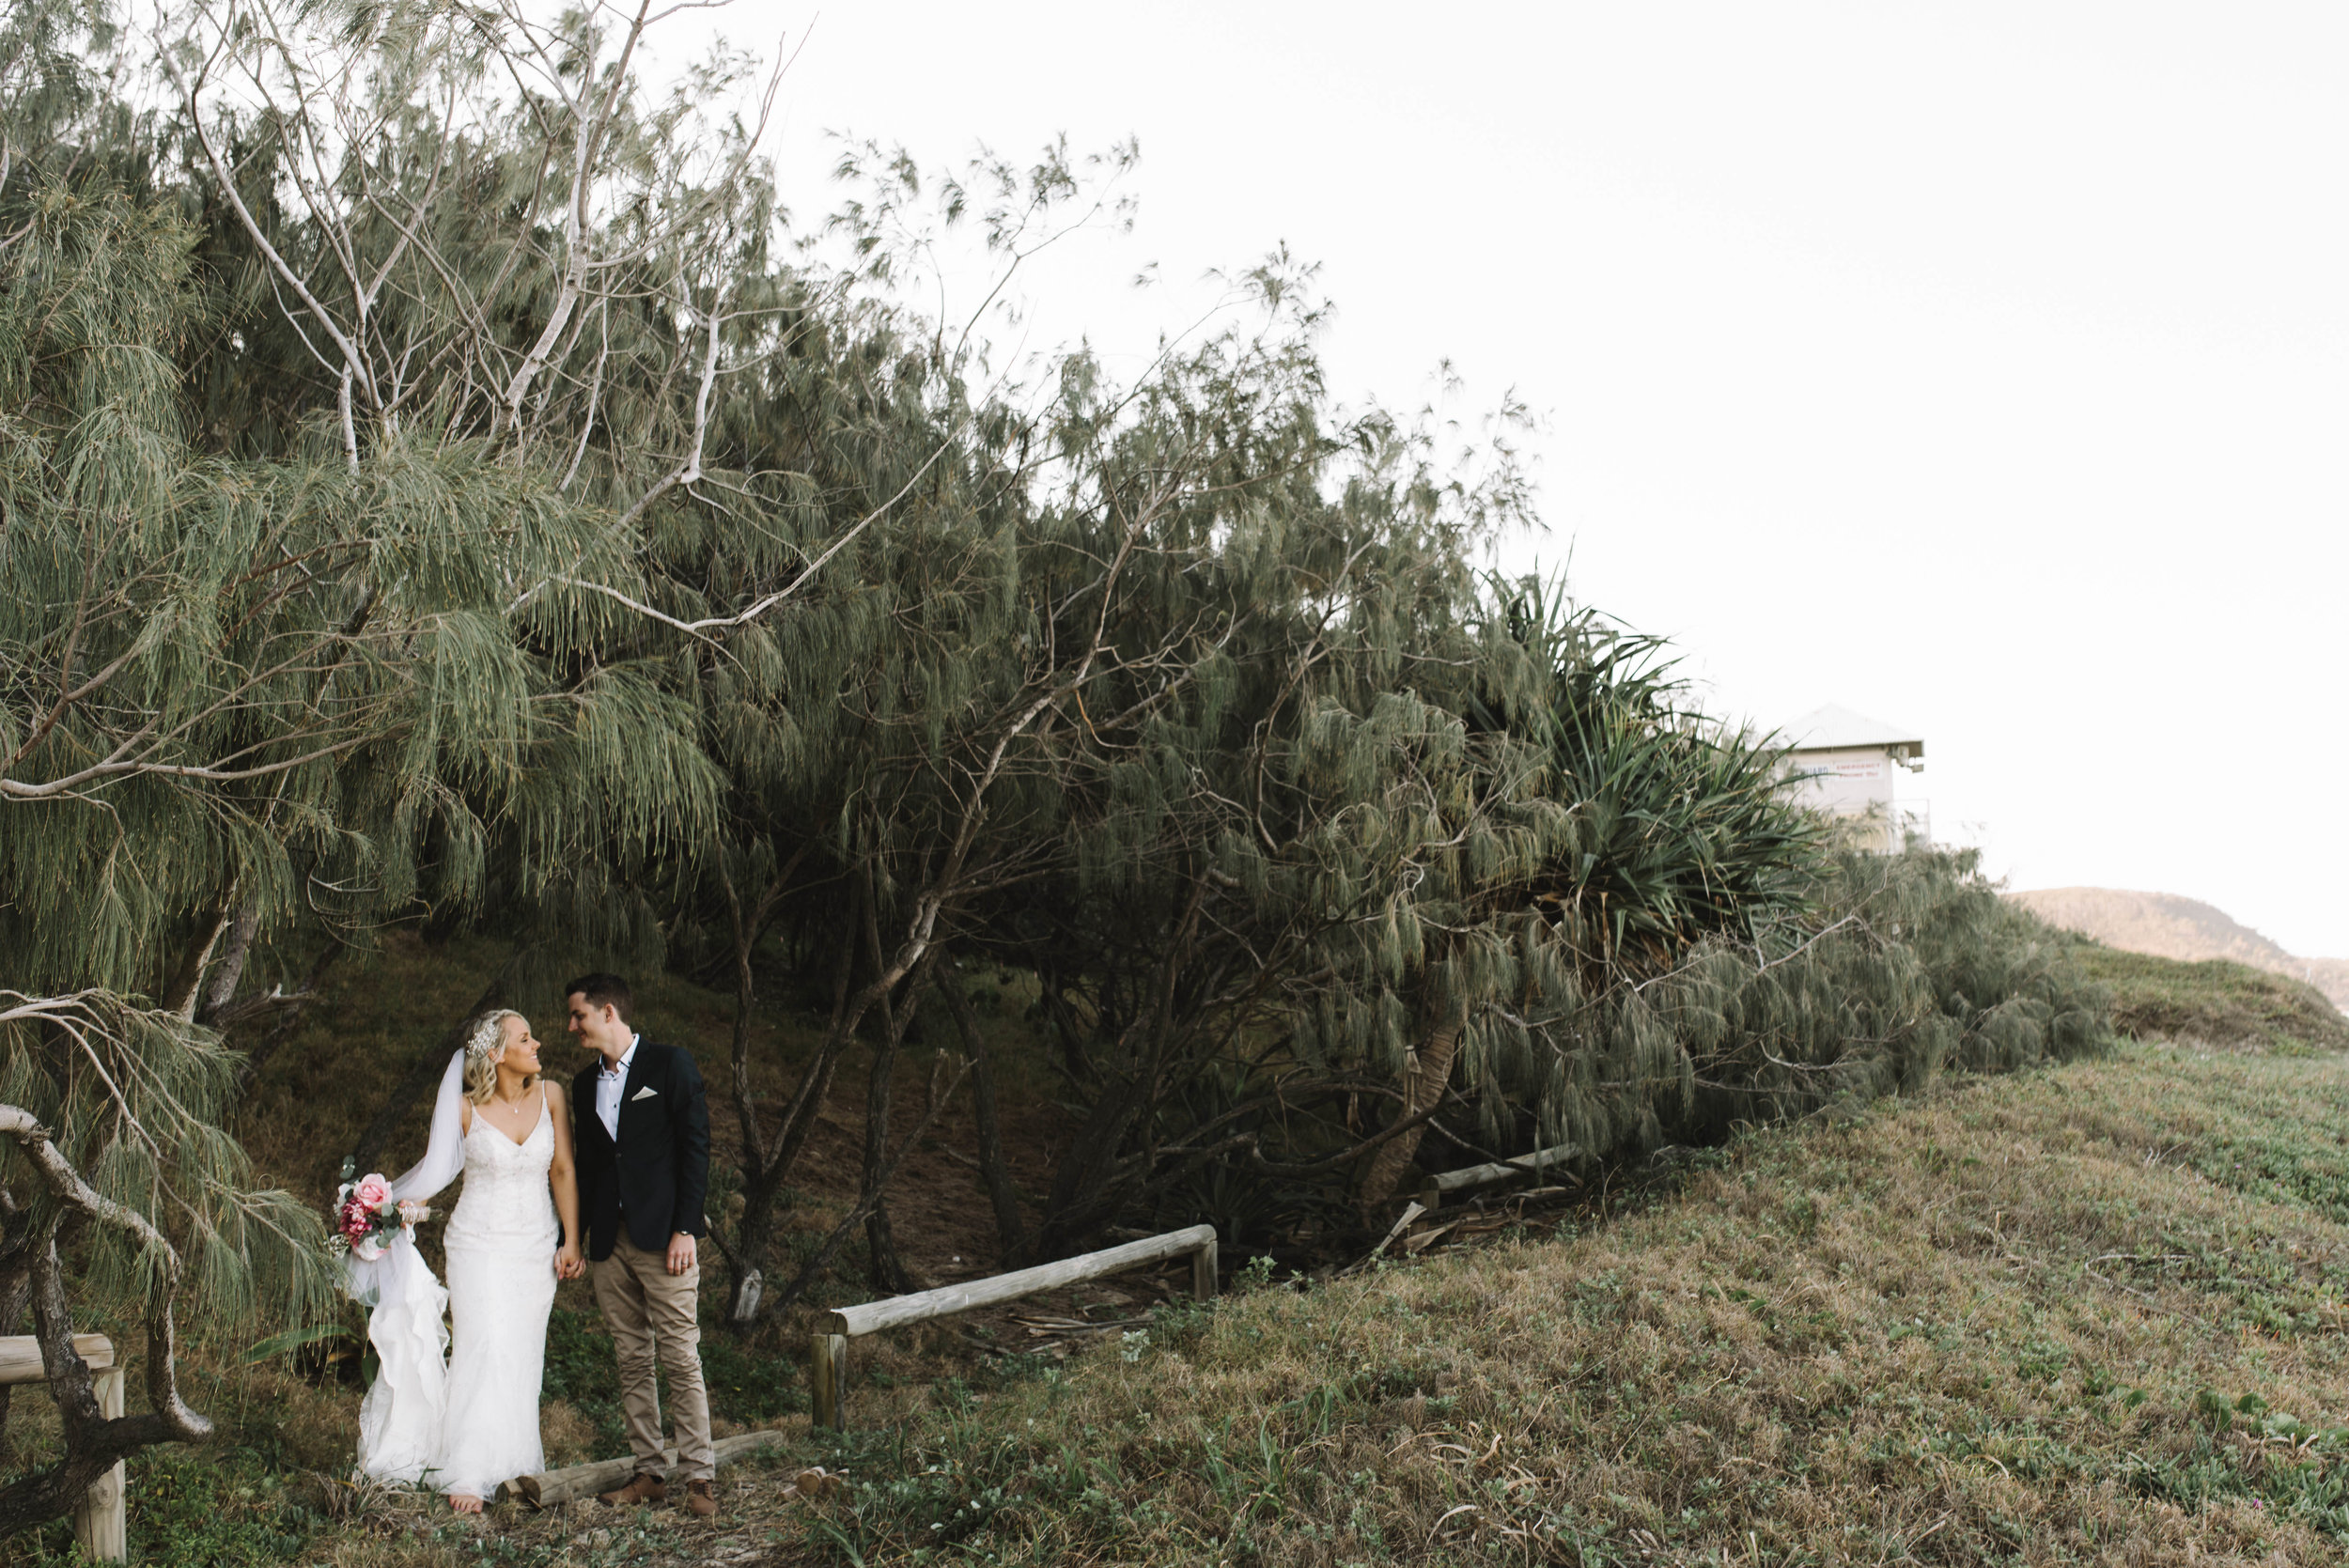 sunshine-coast-wedding-photography-56.jpg